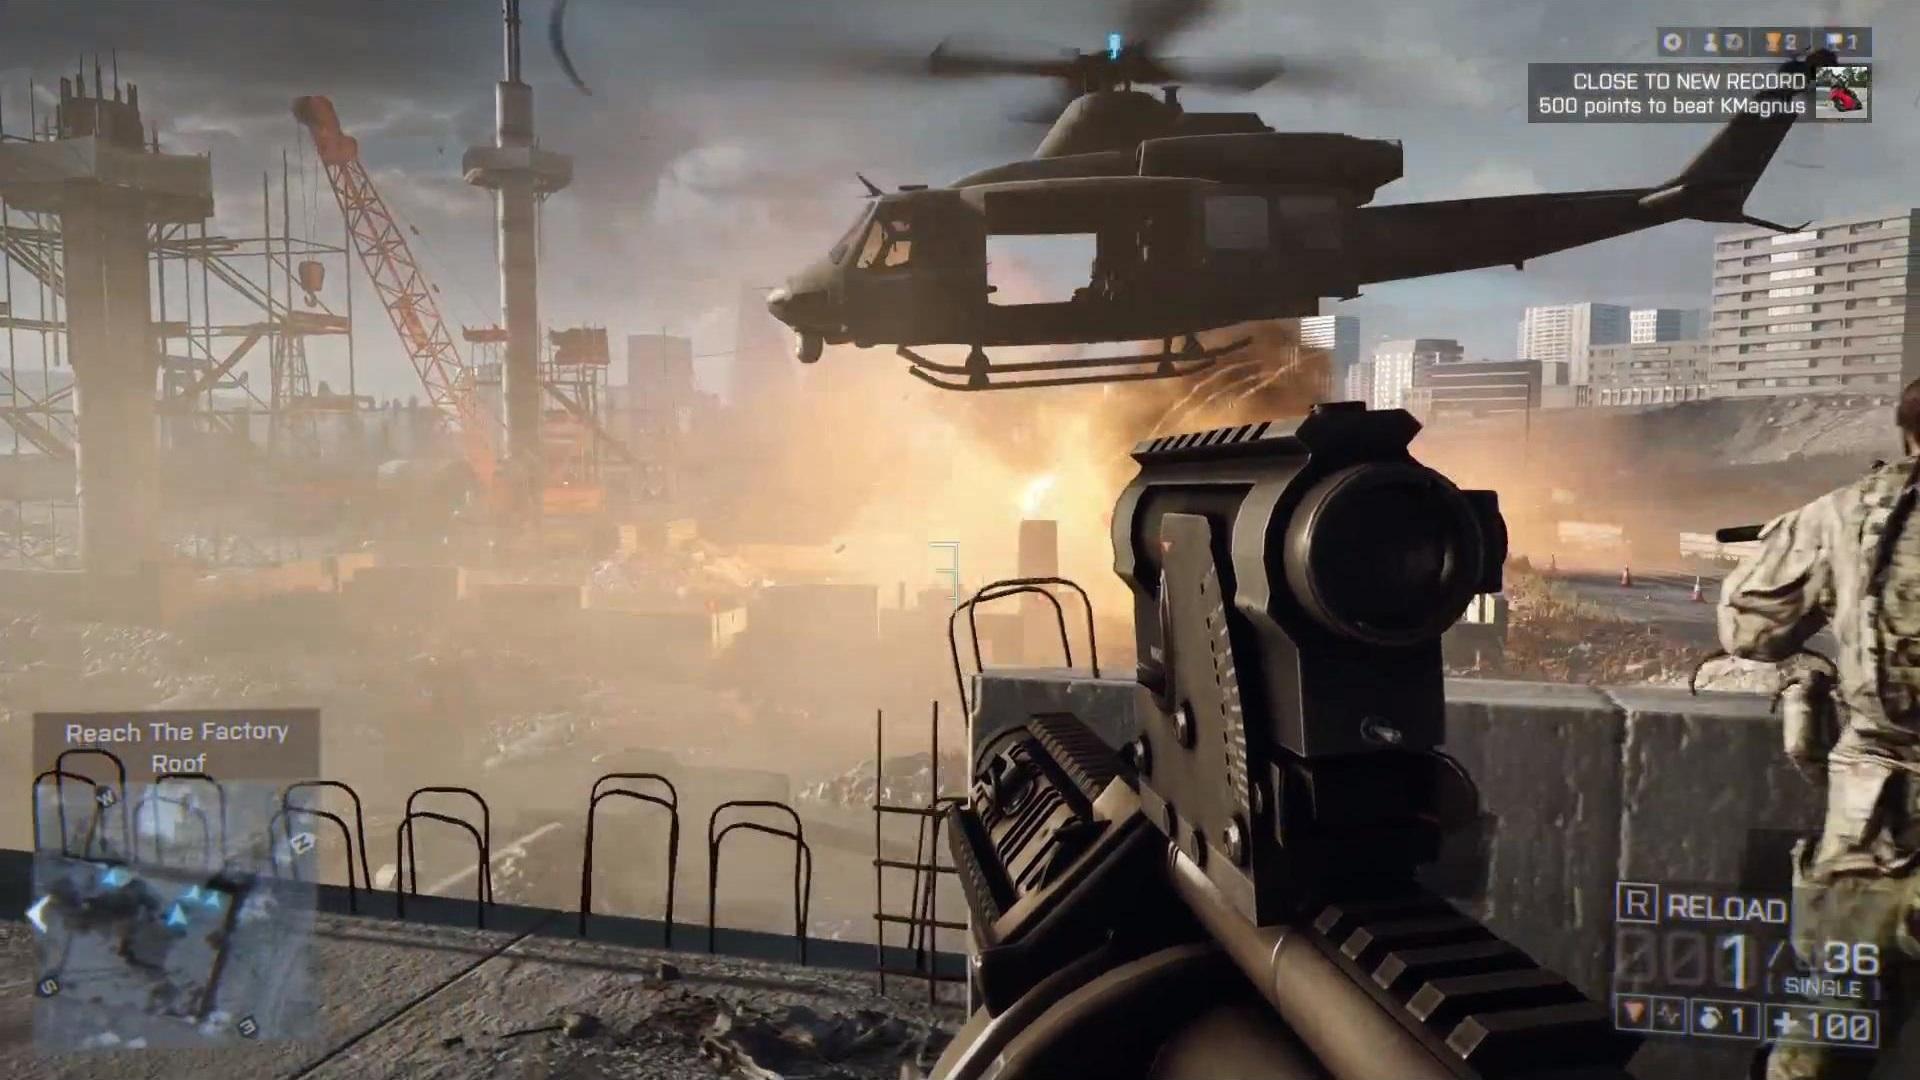 геймплей battlefield 4